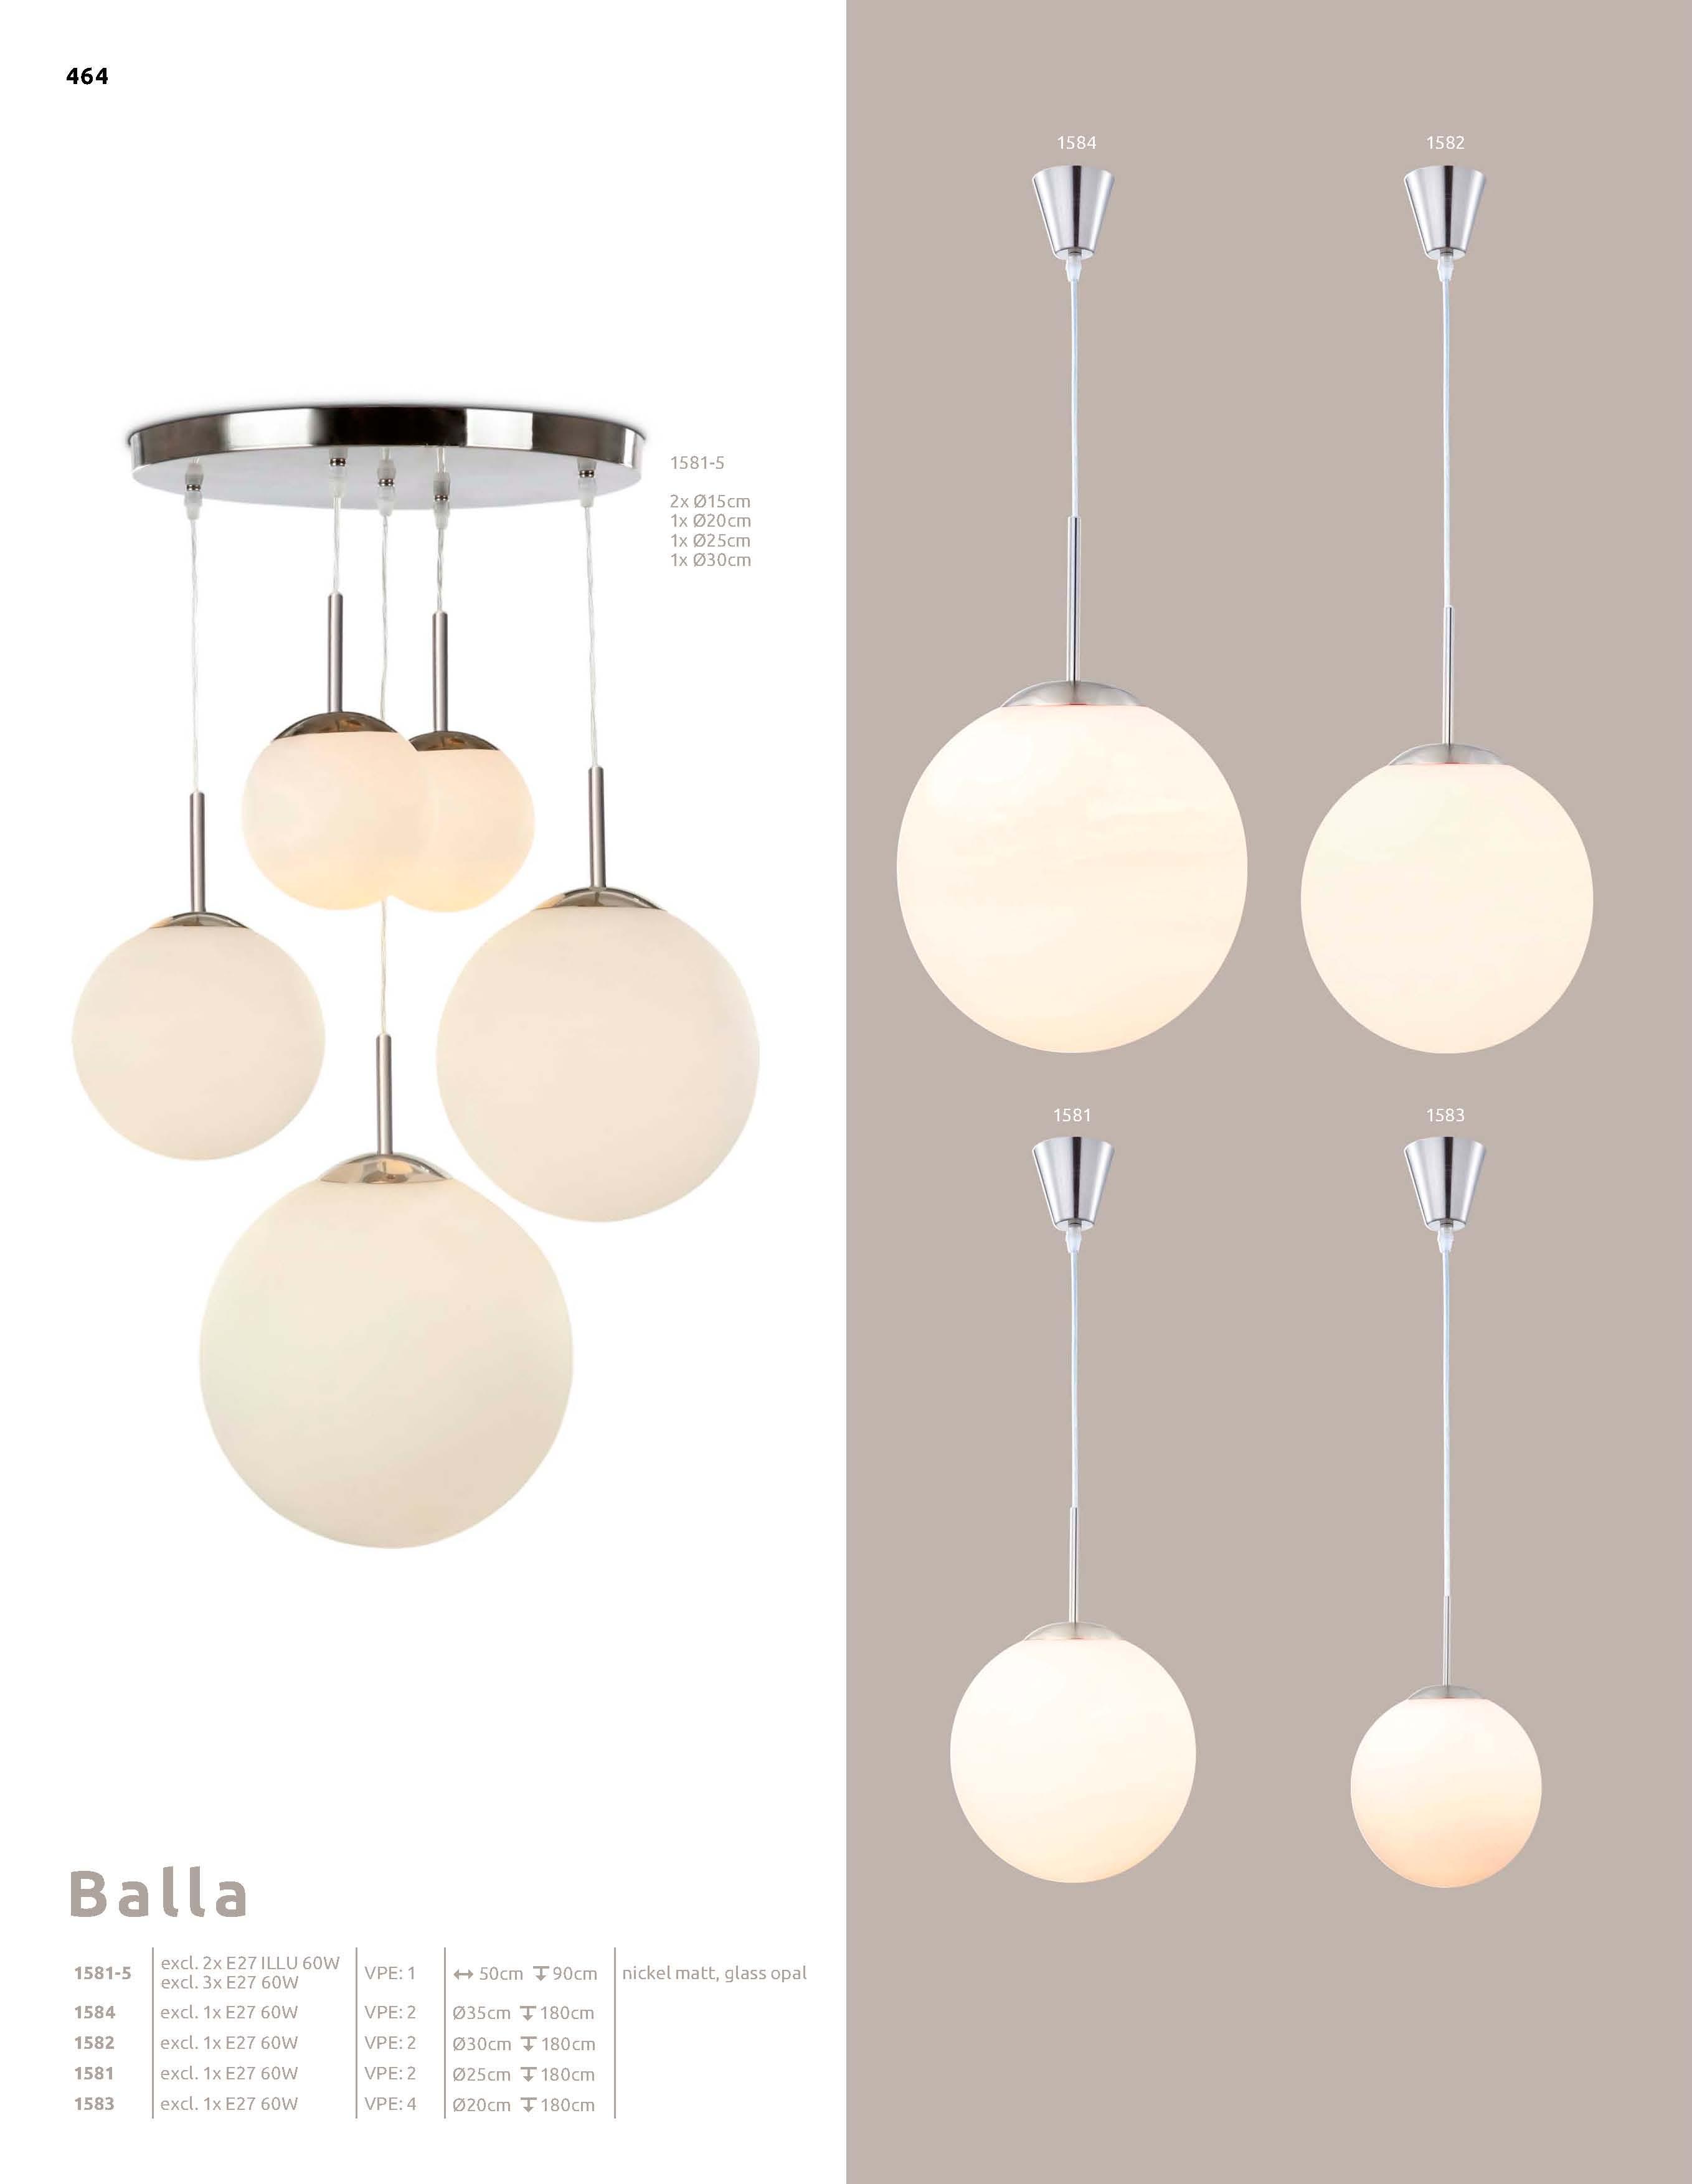 globo 2019年现代灯饰灯具设计书籍目录_礼品设计图片